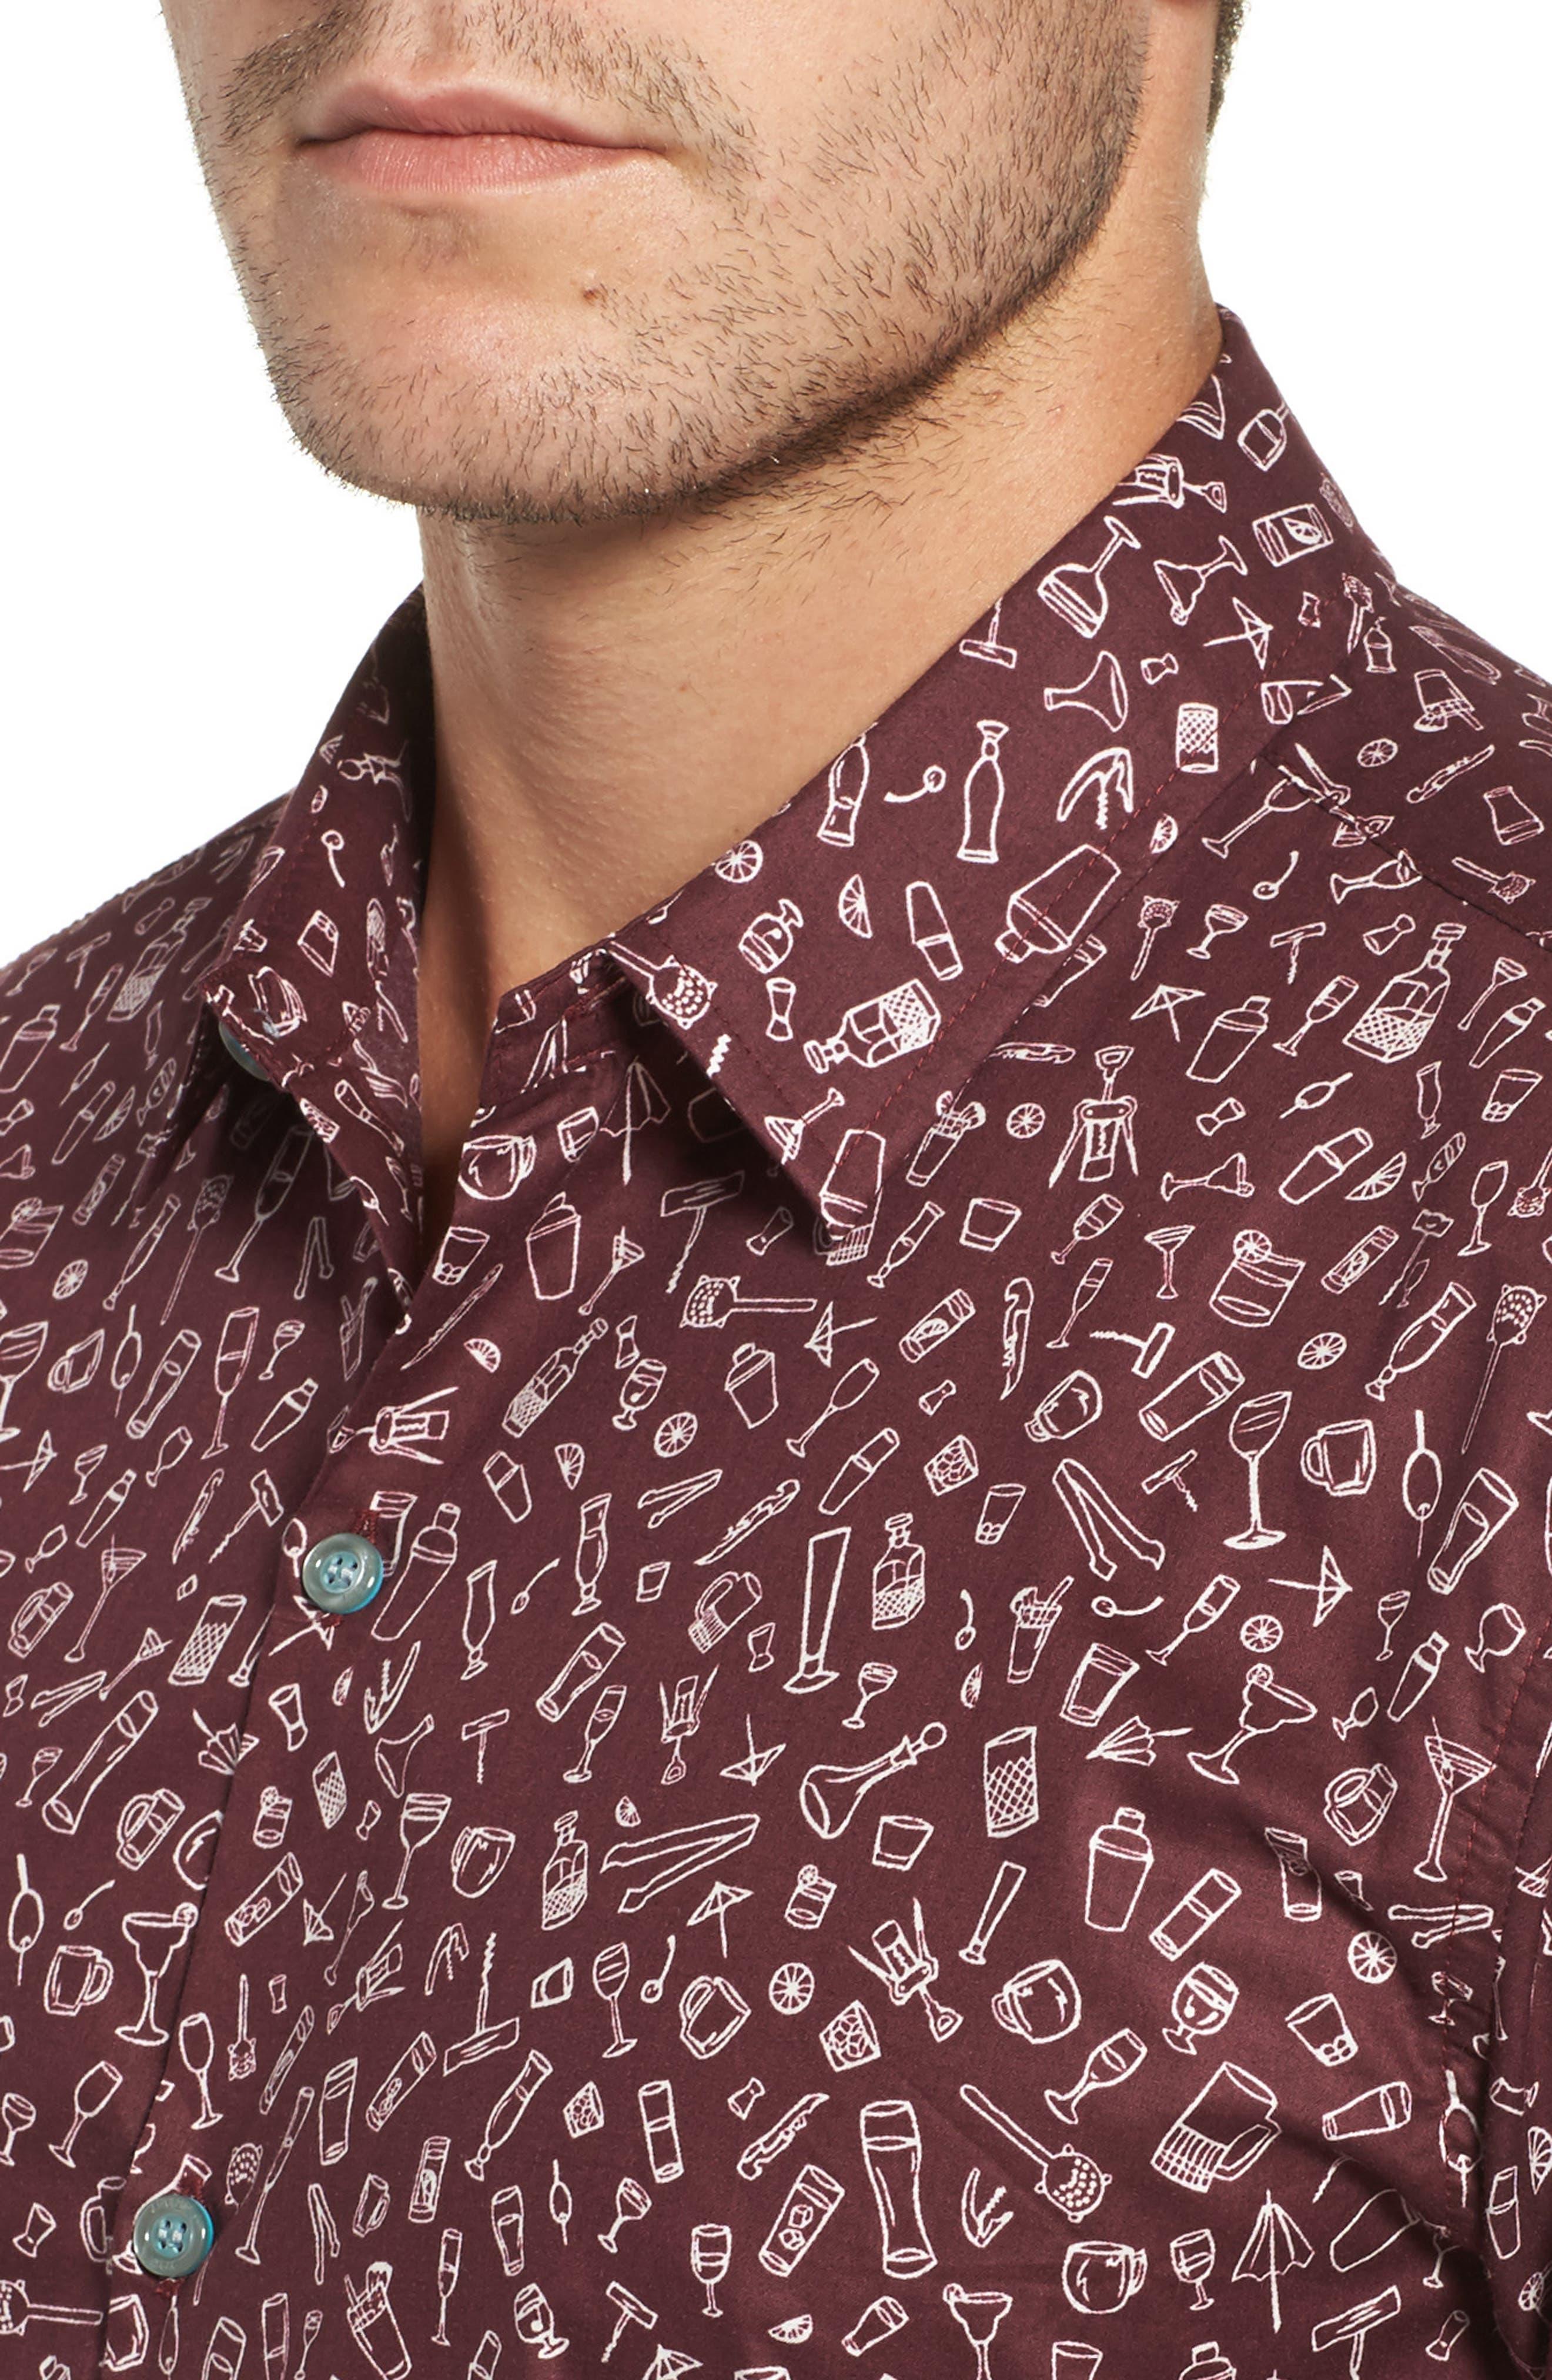 5 PM Slim Fit Camp Shirt,                             Alternate thumbnail 4, color,                             600